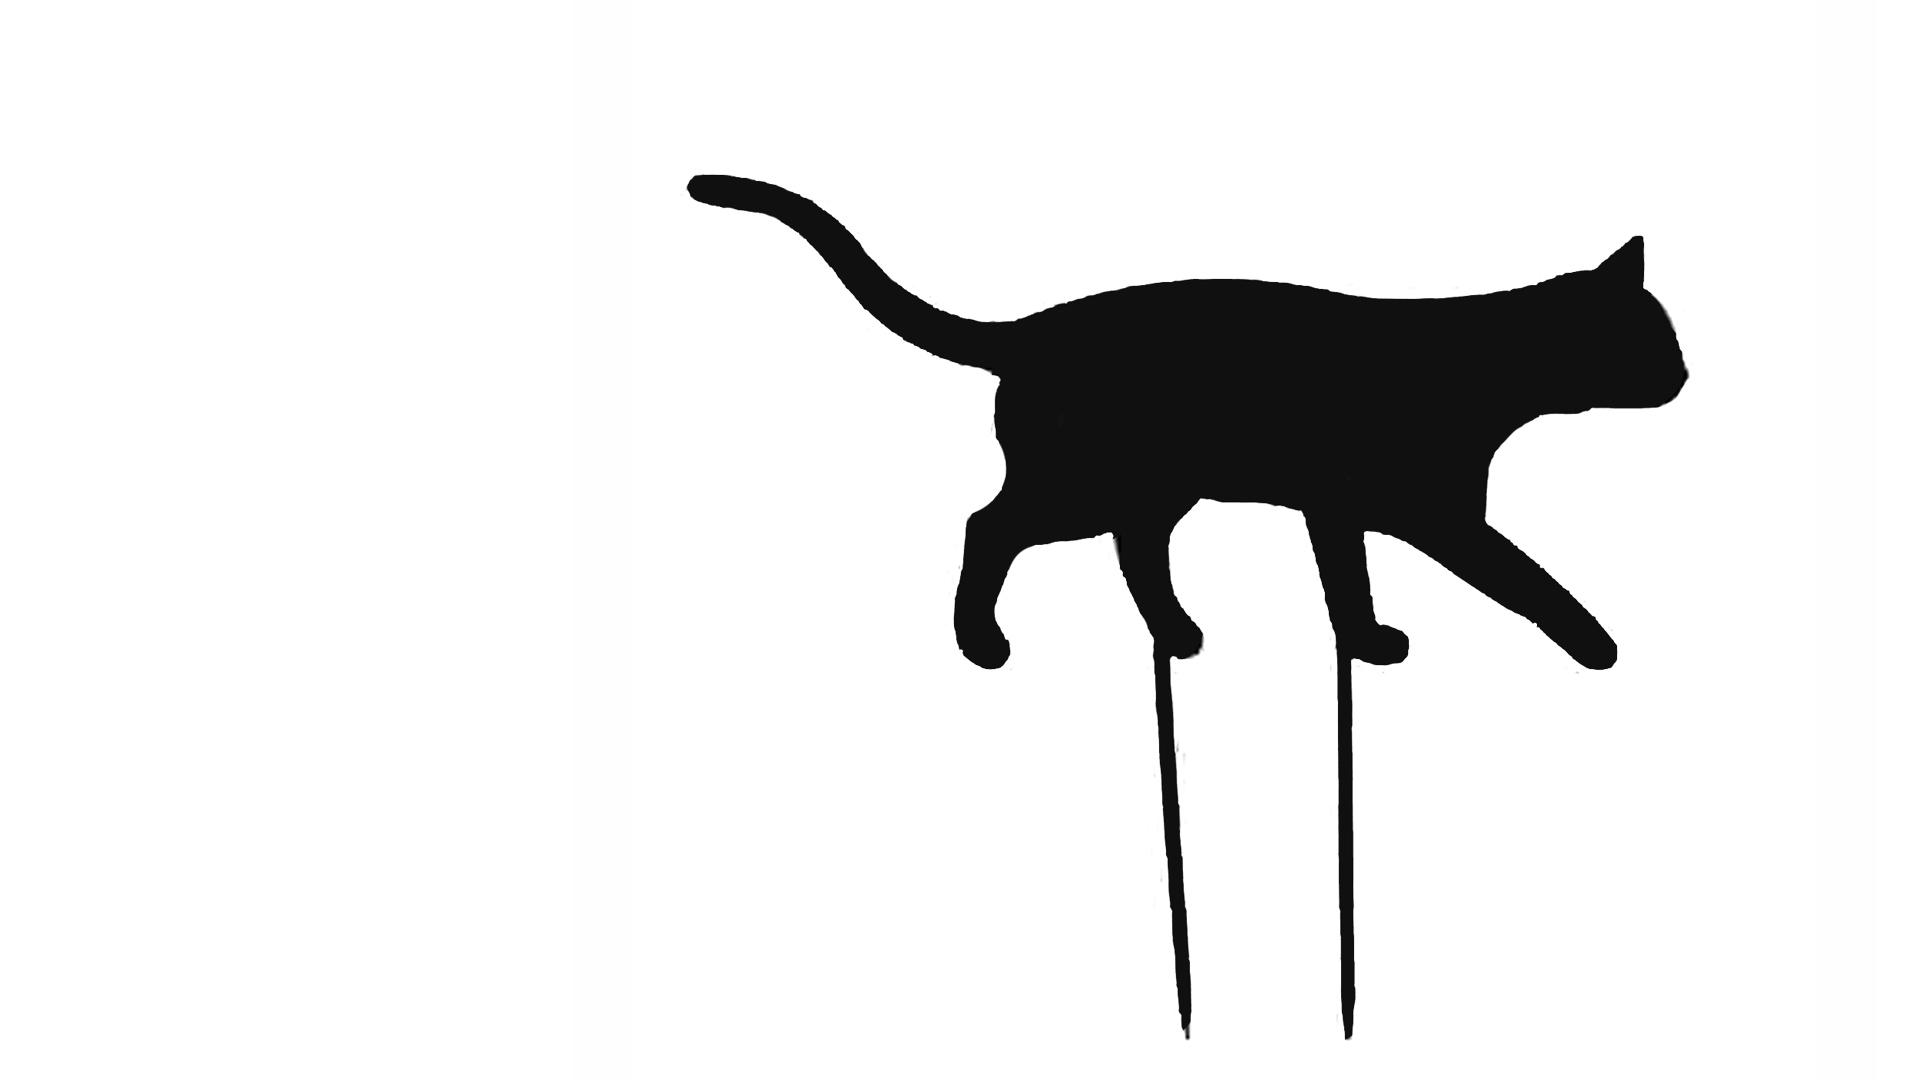 Decorative Black Cat Silhouette - Celebrity Big Brother 2017